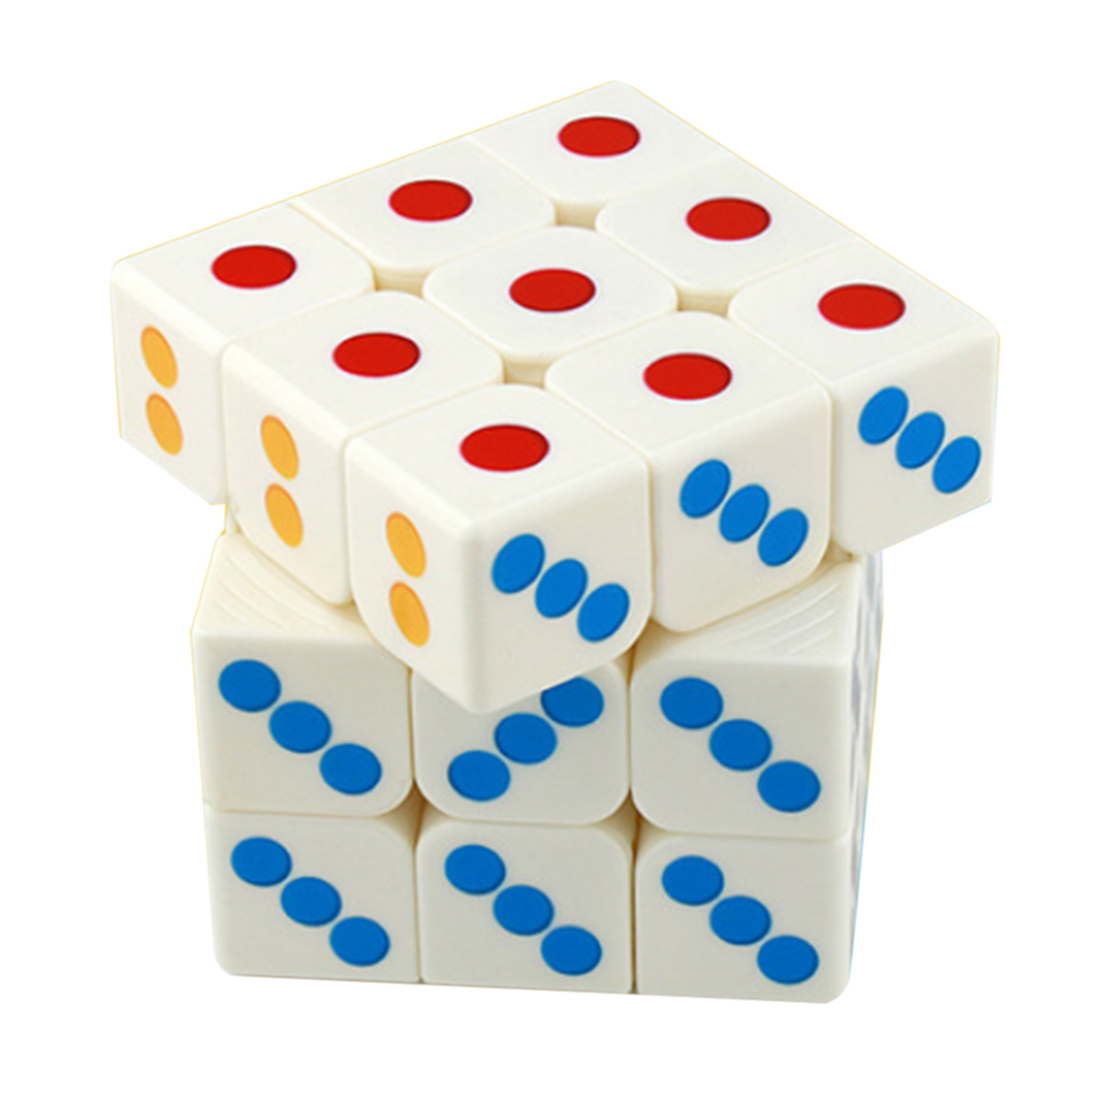 Rubikova kostka - 3x3x3 - Hrací kostka